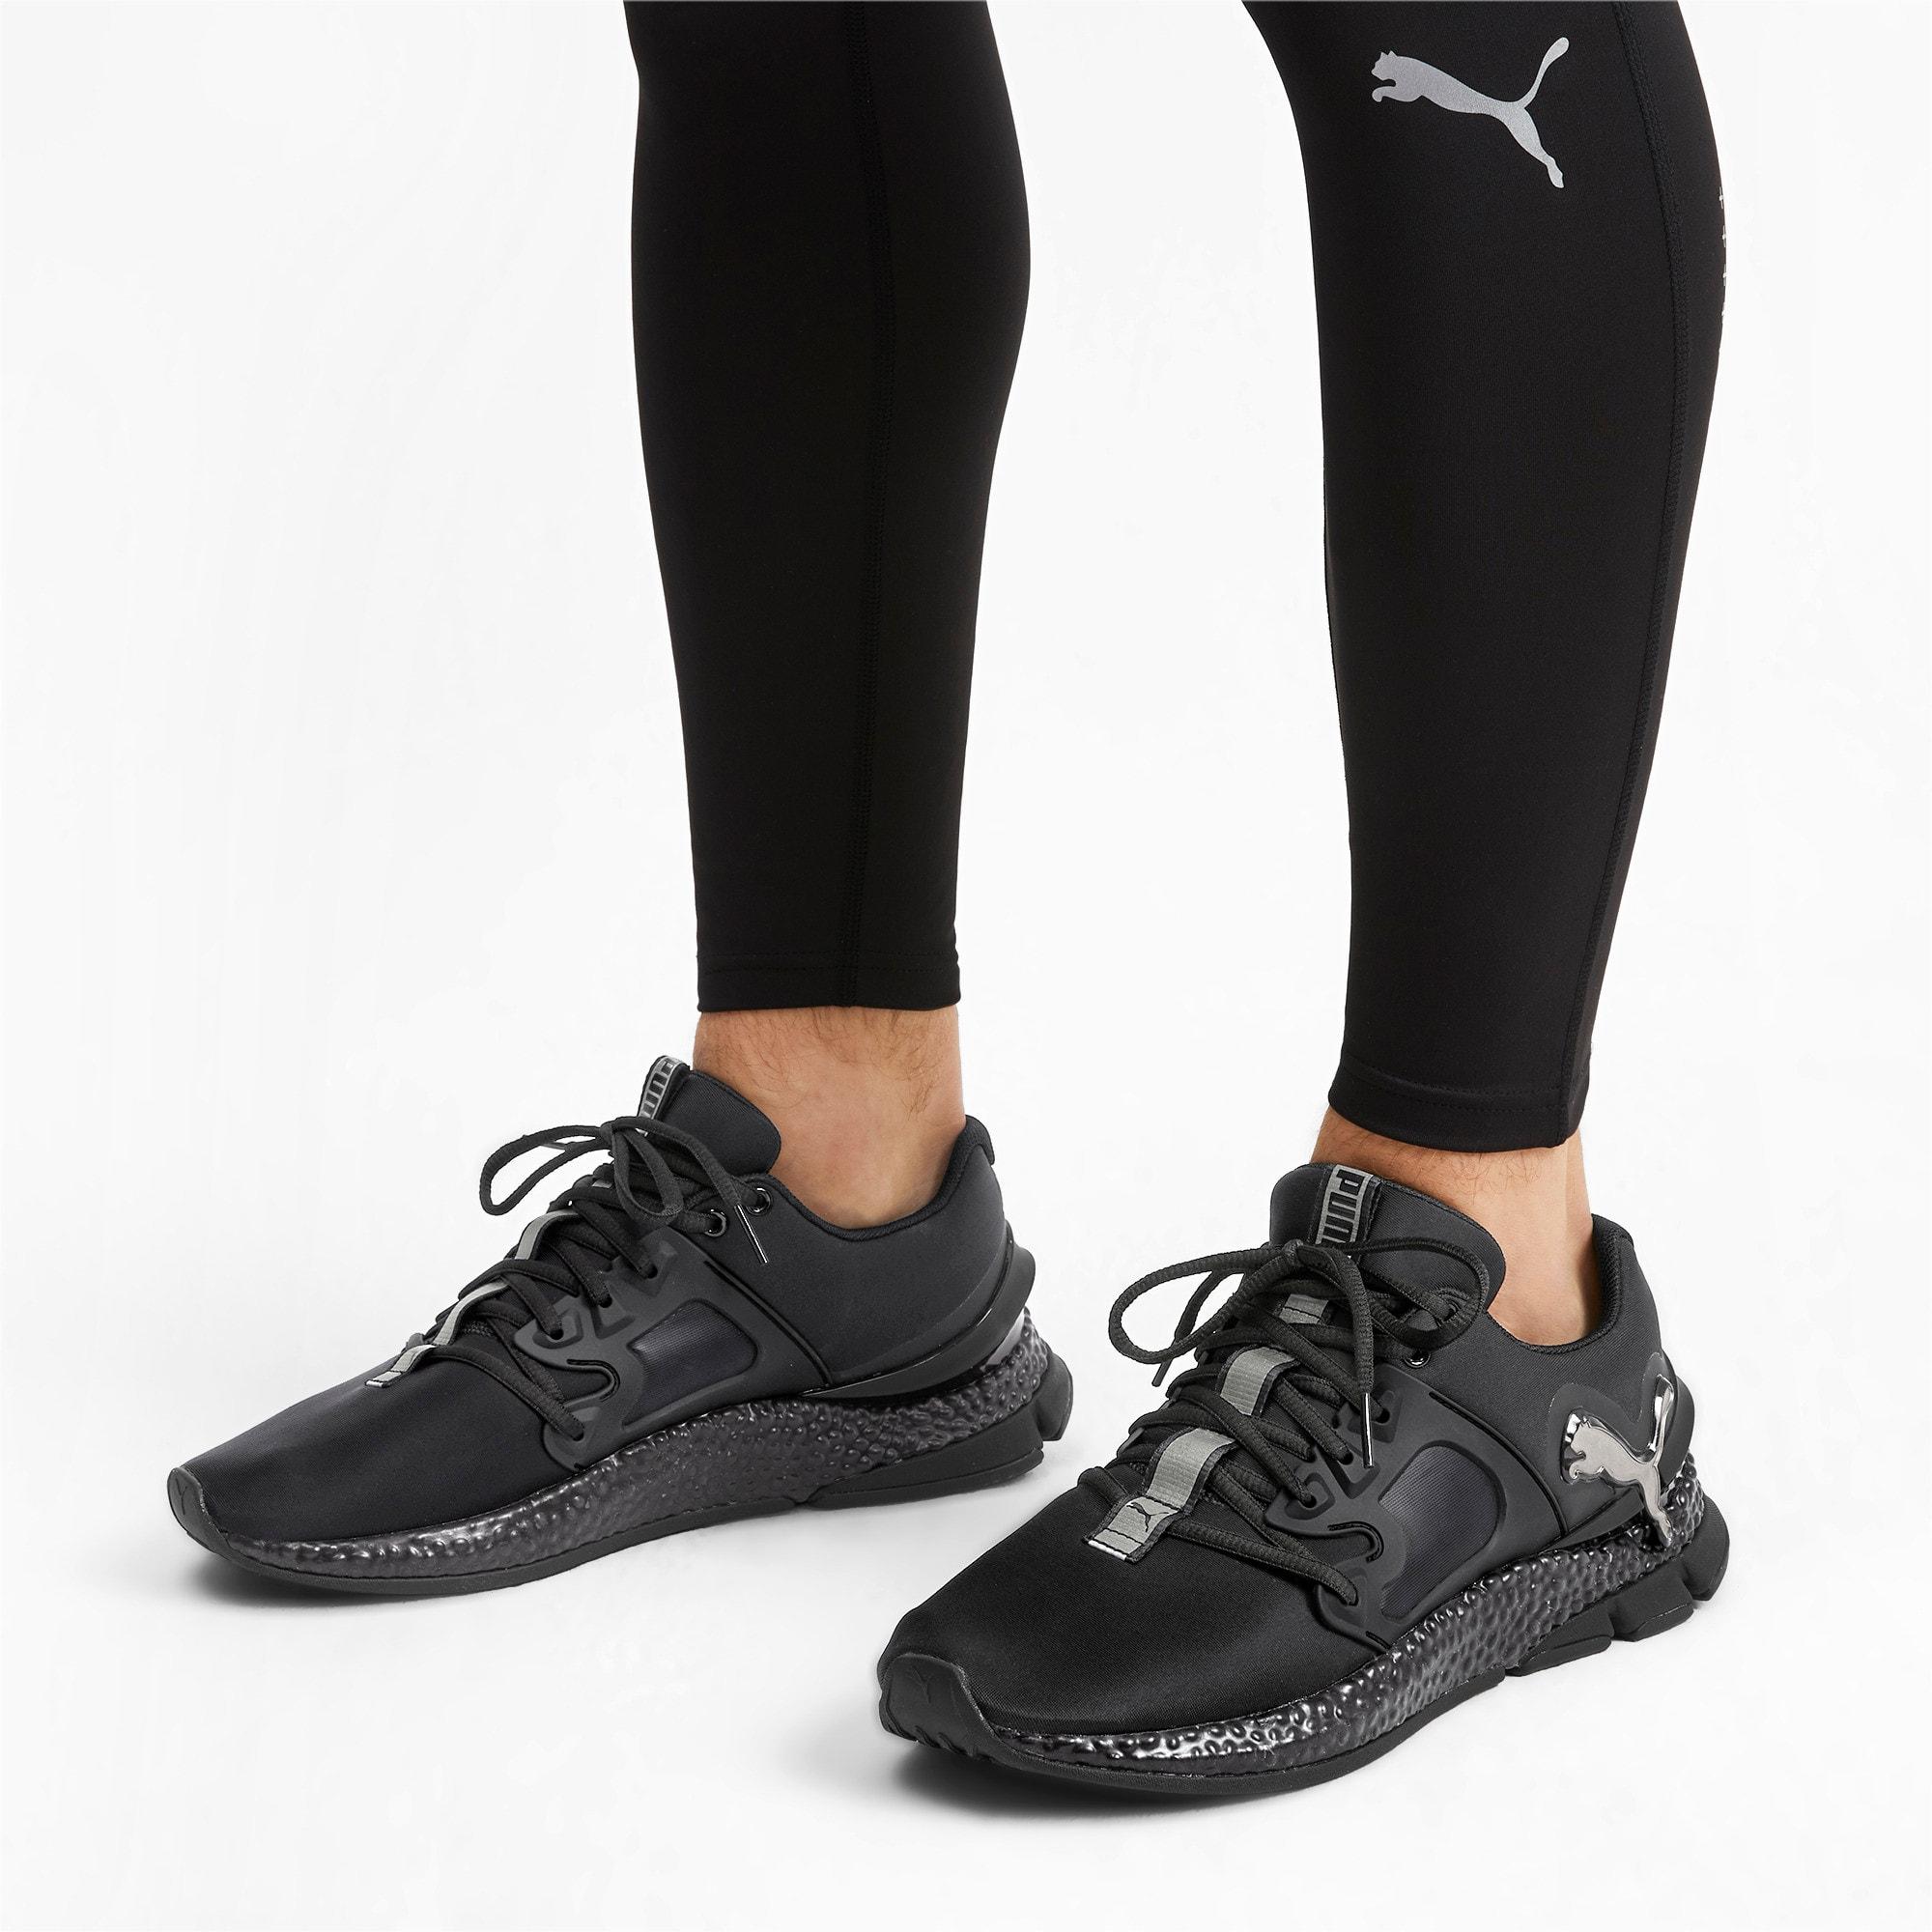 Thumbnail 2 of HYBRID Sky Rave Men's Running Shoes, Puma Black-Puma Aged Silver, medium